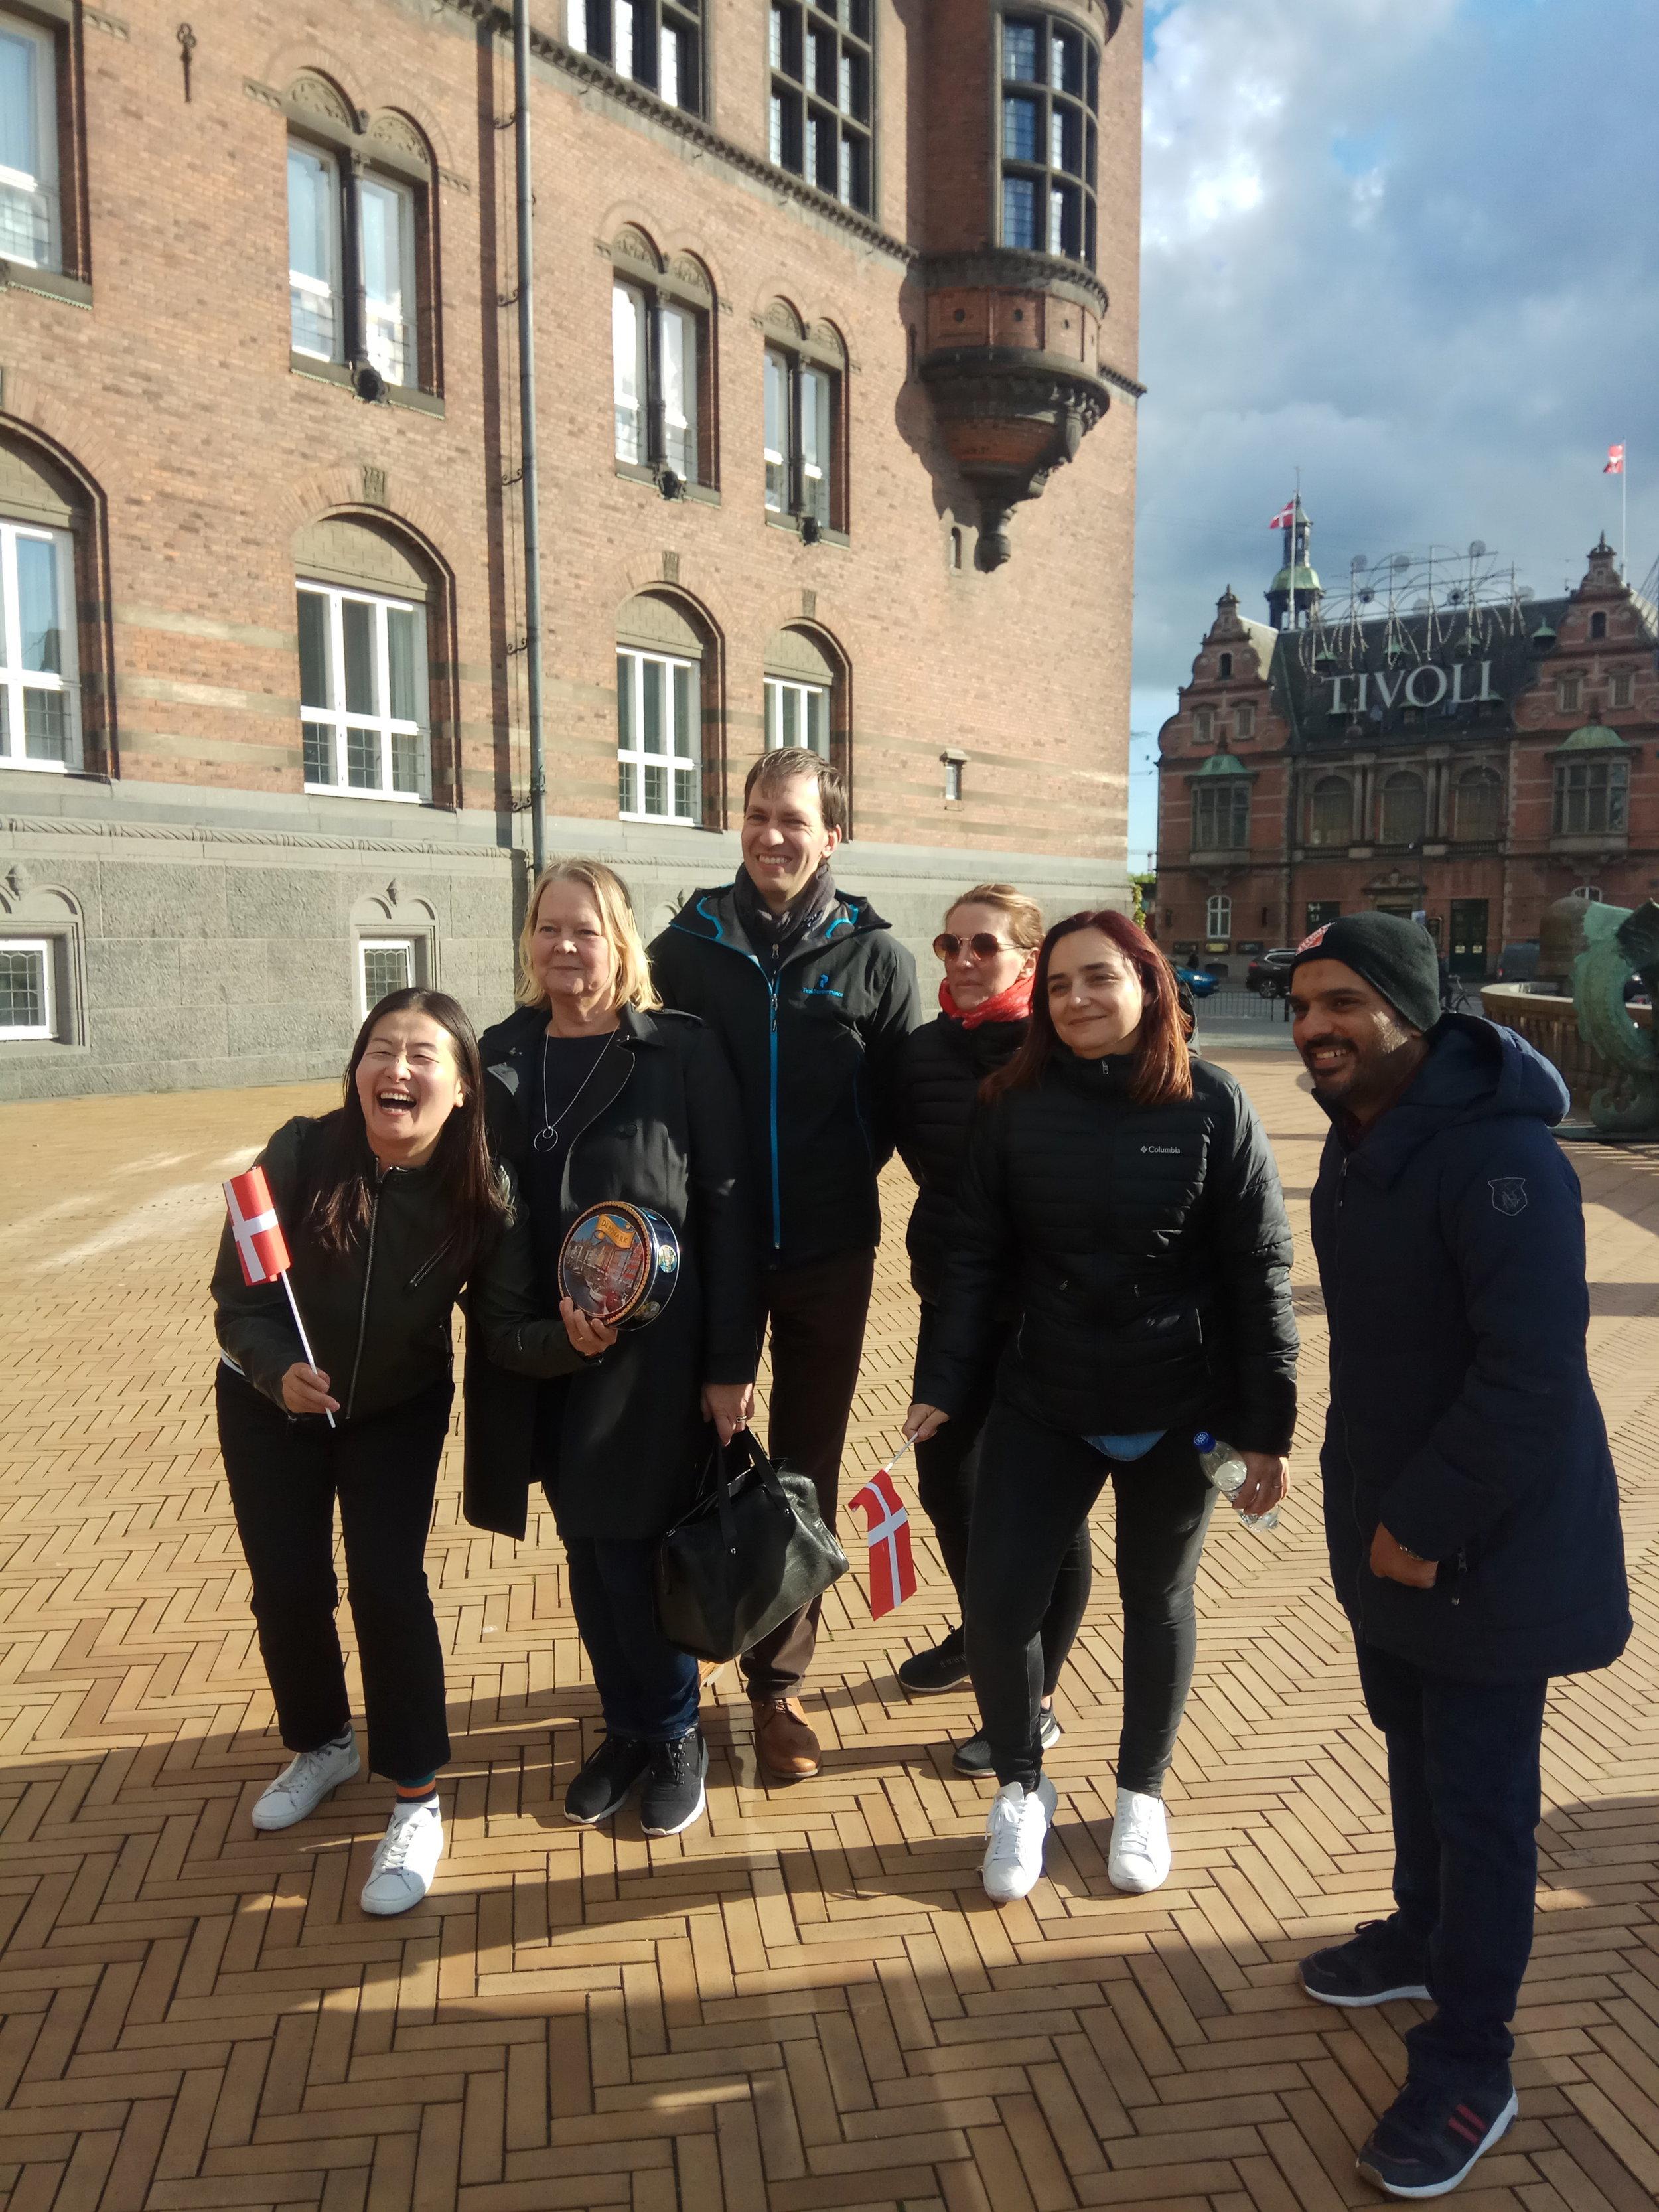 IMG_20190507_175749 - 100 Point Challenge Copenhagen.jpg